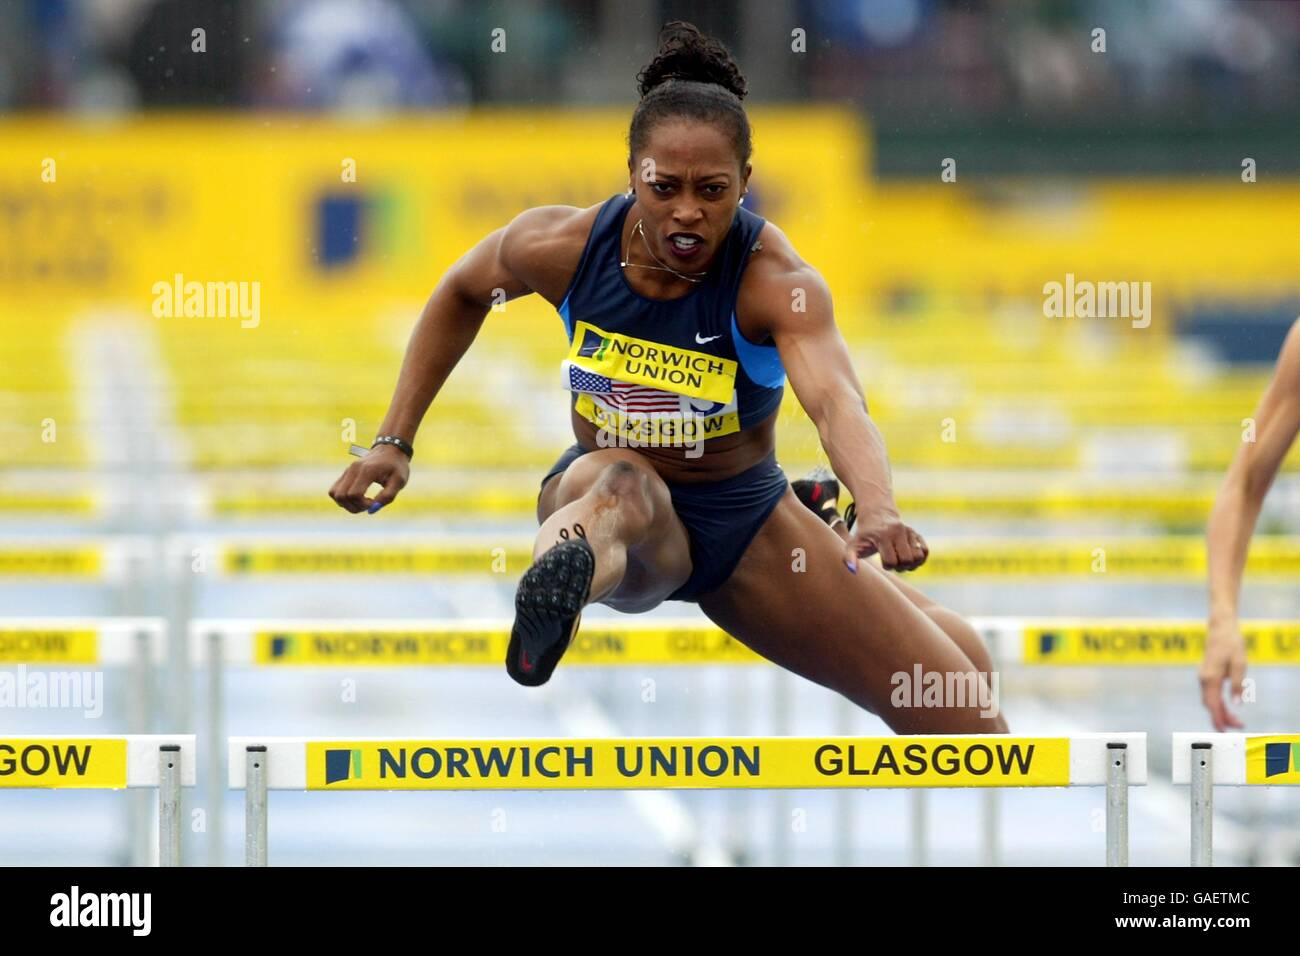 Athletics - Norwich Union Challenge - Great Britain v Russia v USA - Women's 100 Metre Hurdles - Stock Image